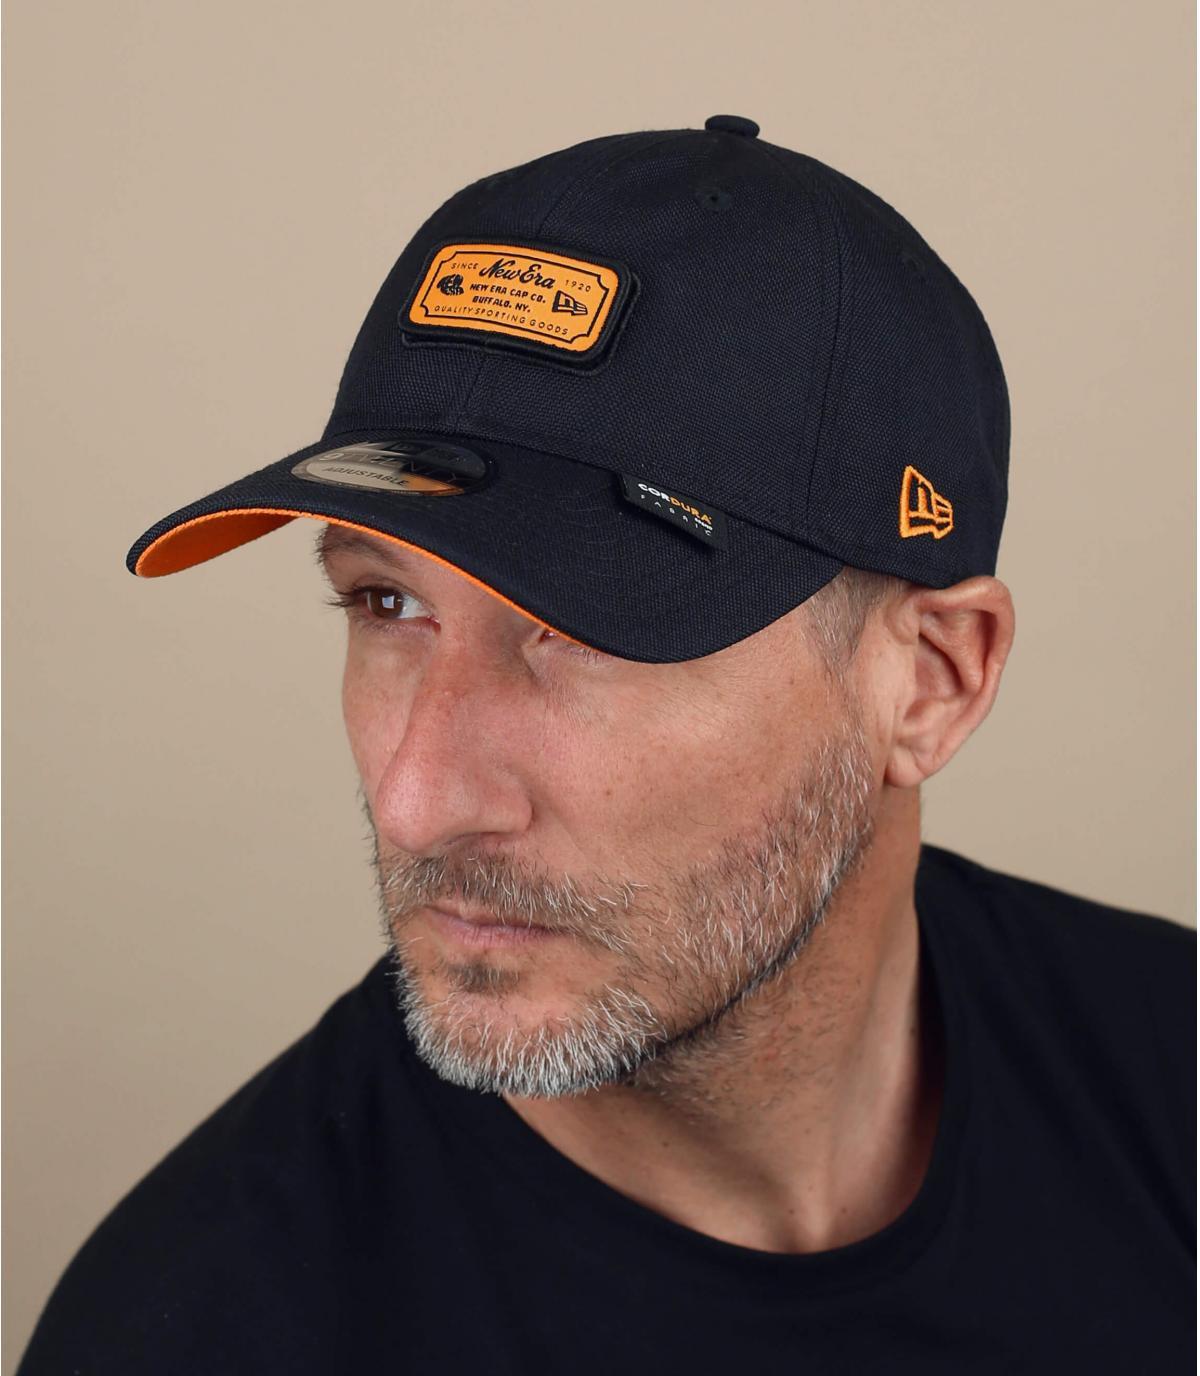 Black orange New Era cap